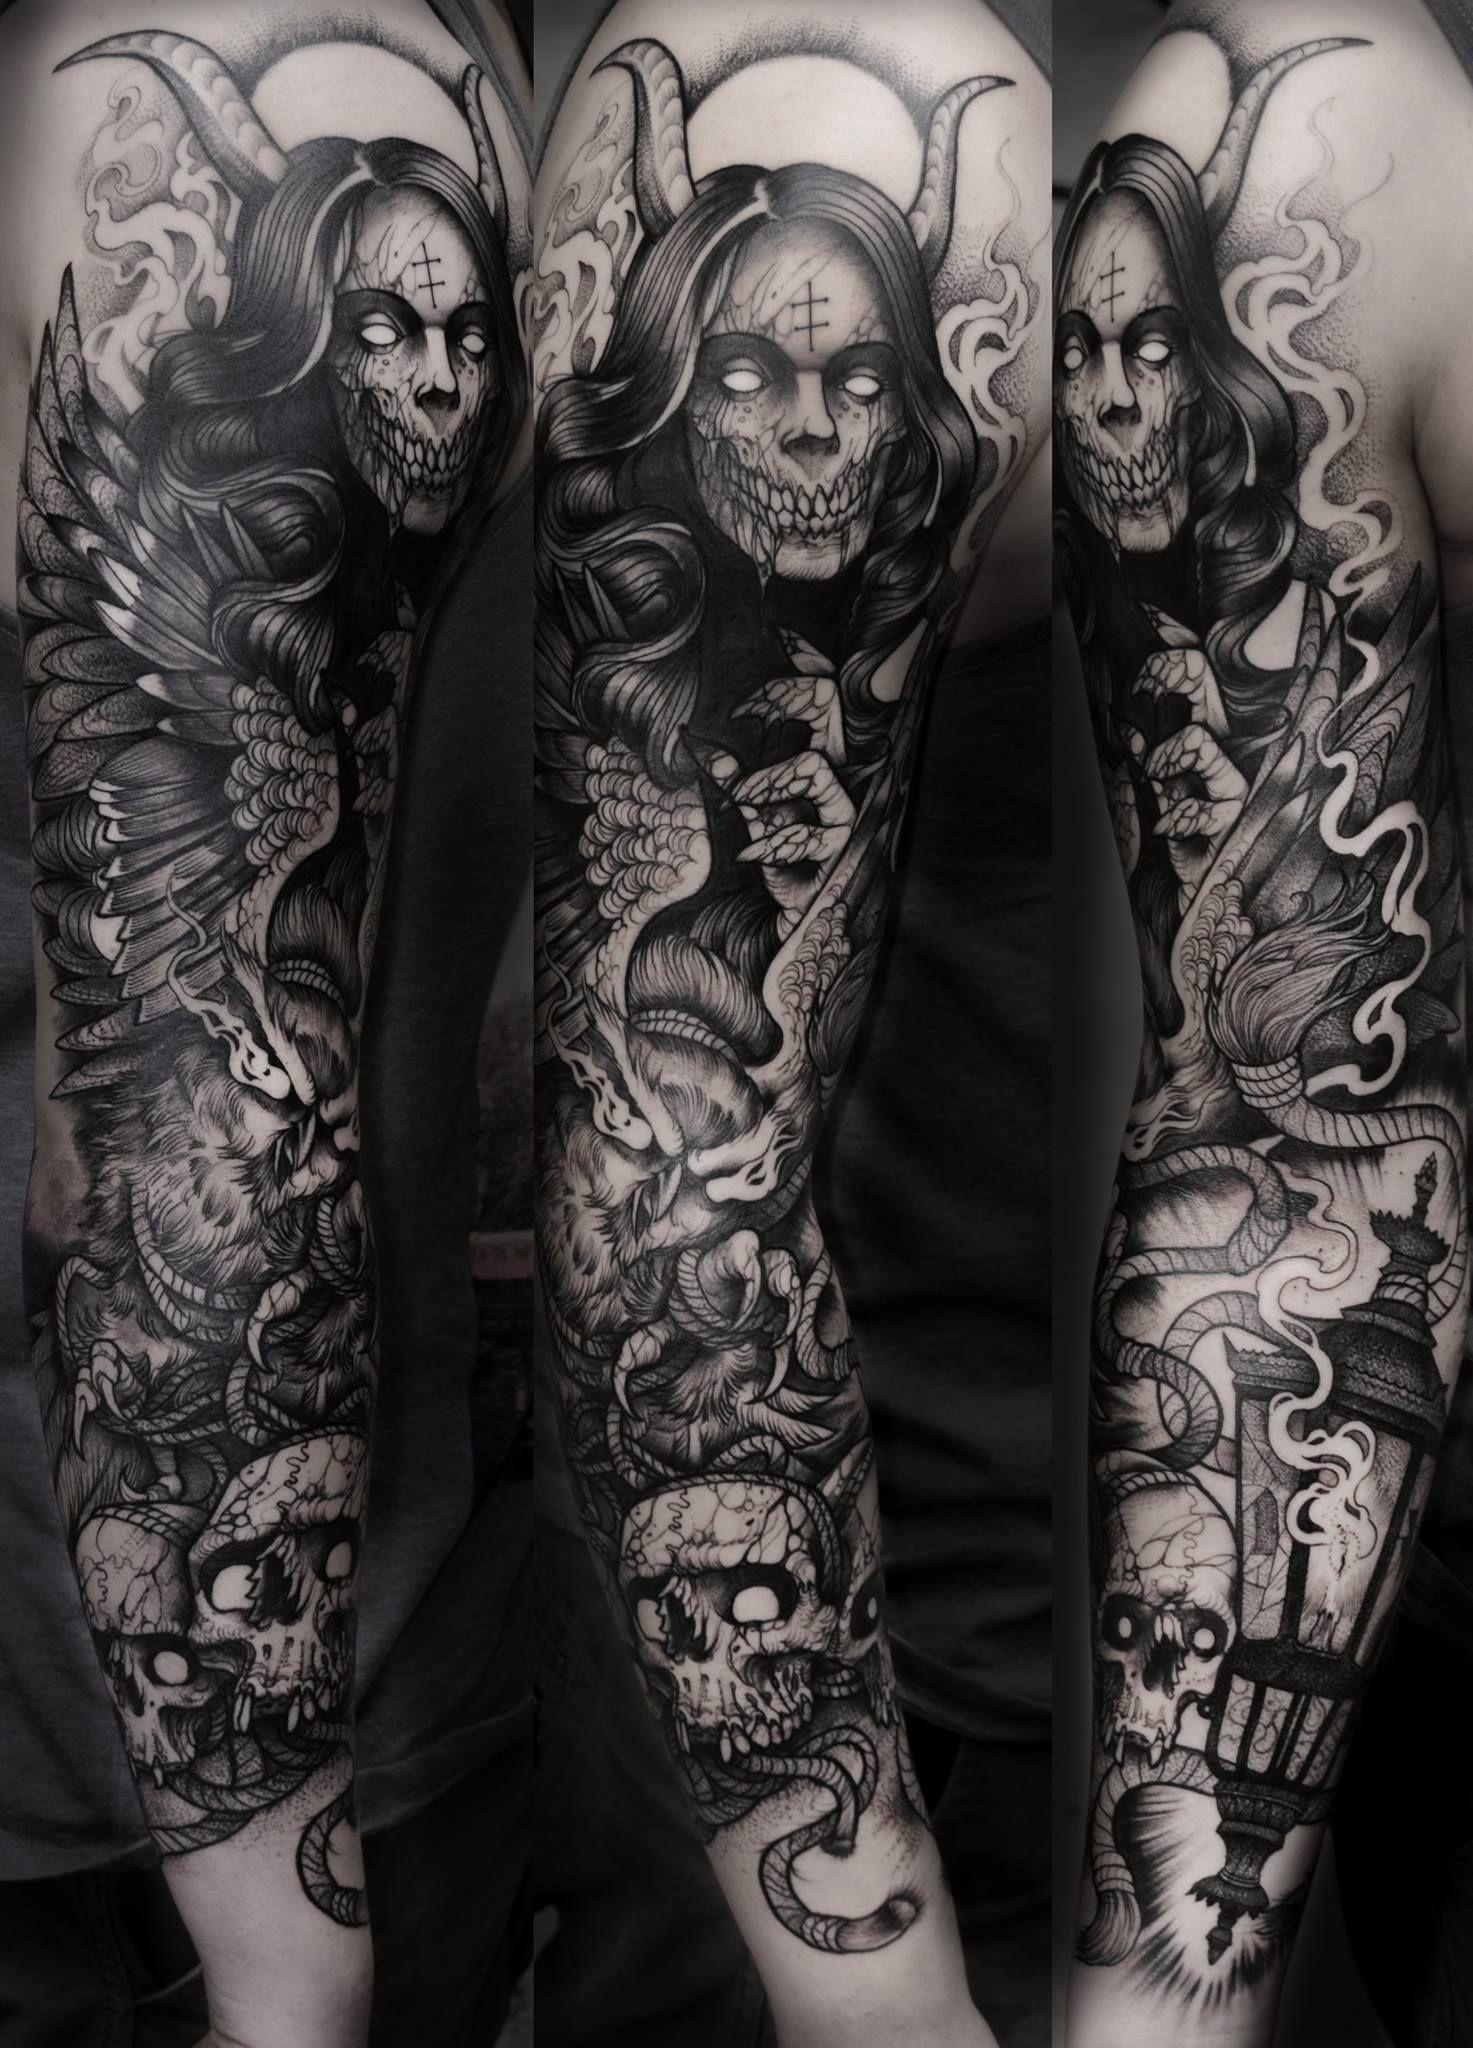 402f832f5 Macabre Sleeve Tattoo by Grindesign   tattoos   Full sleeve tattoos ...